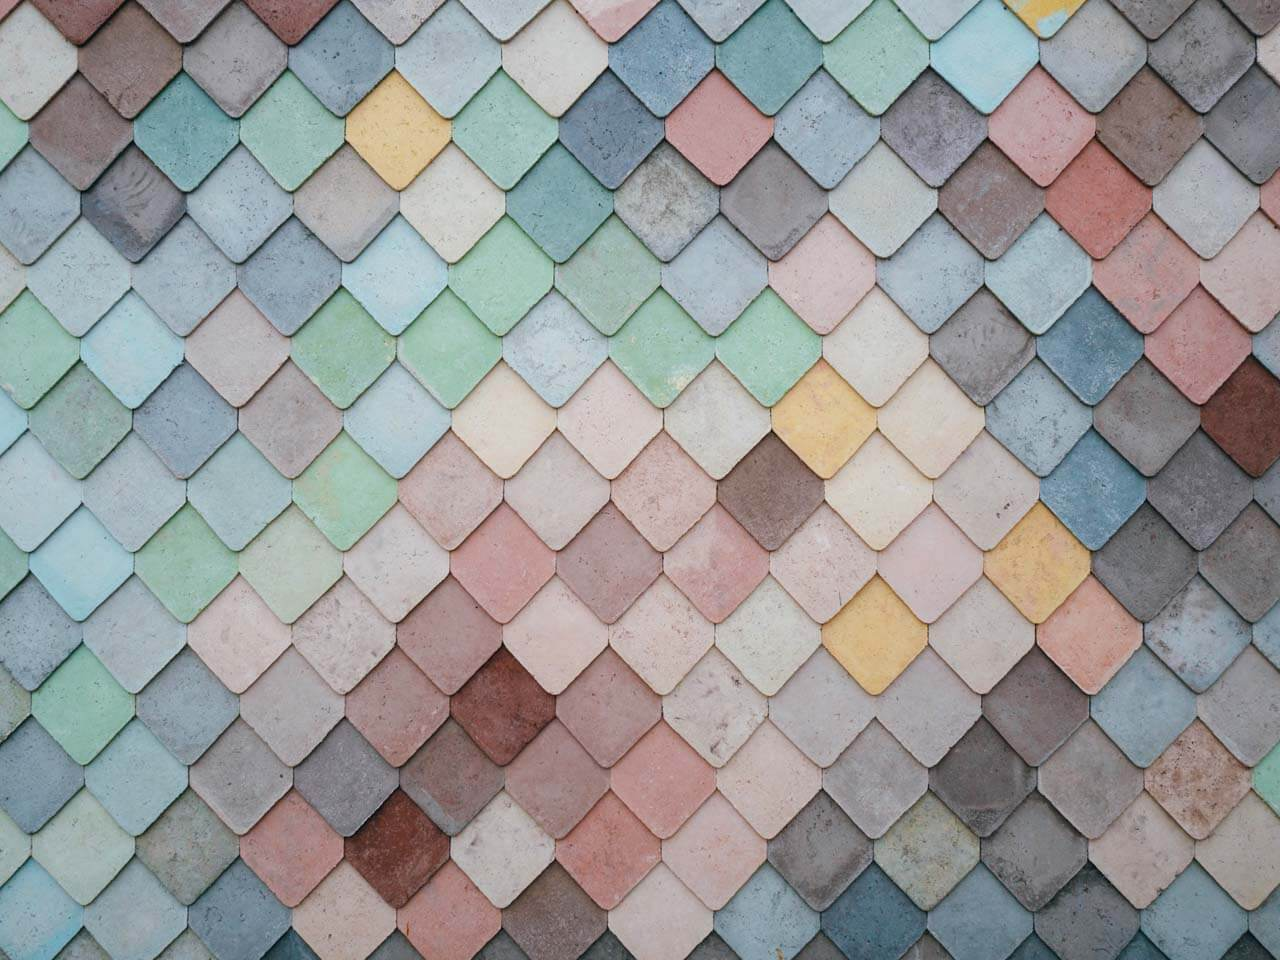 Foshan Ceramic Tiles Markets